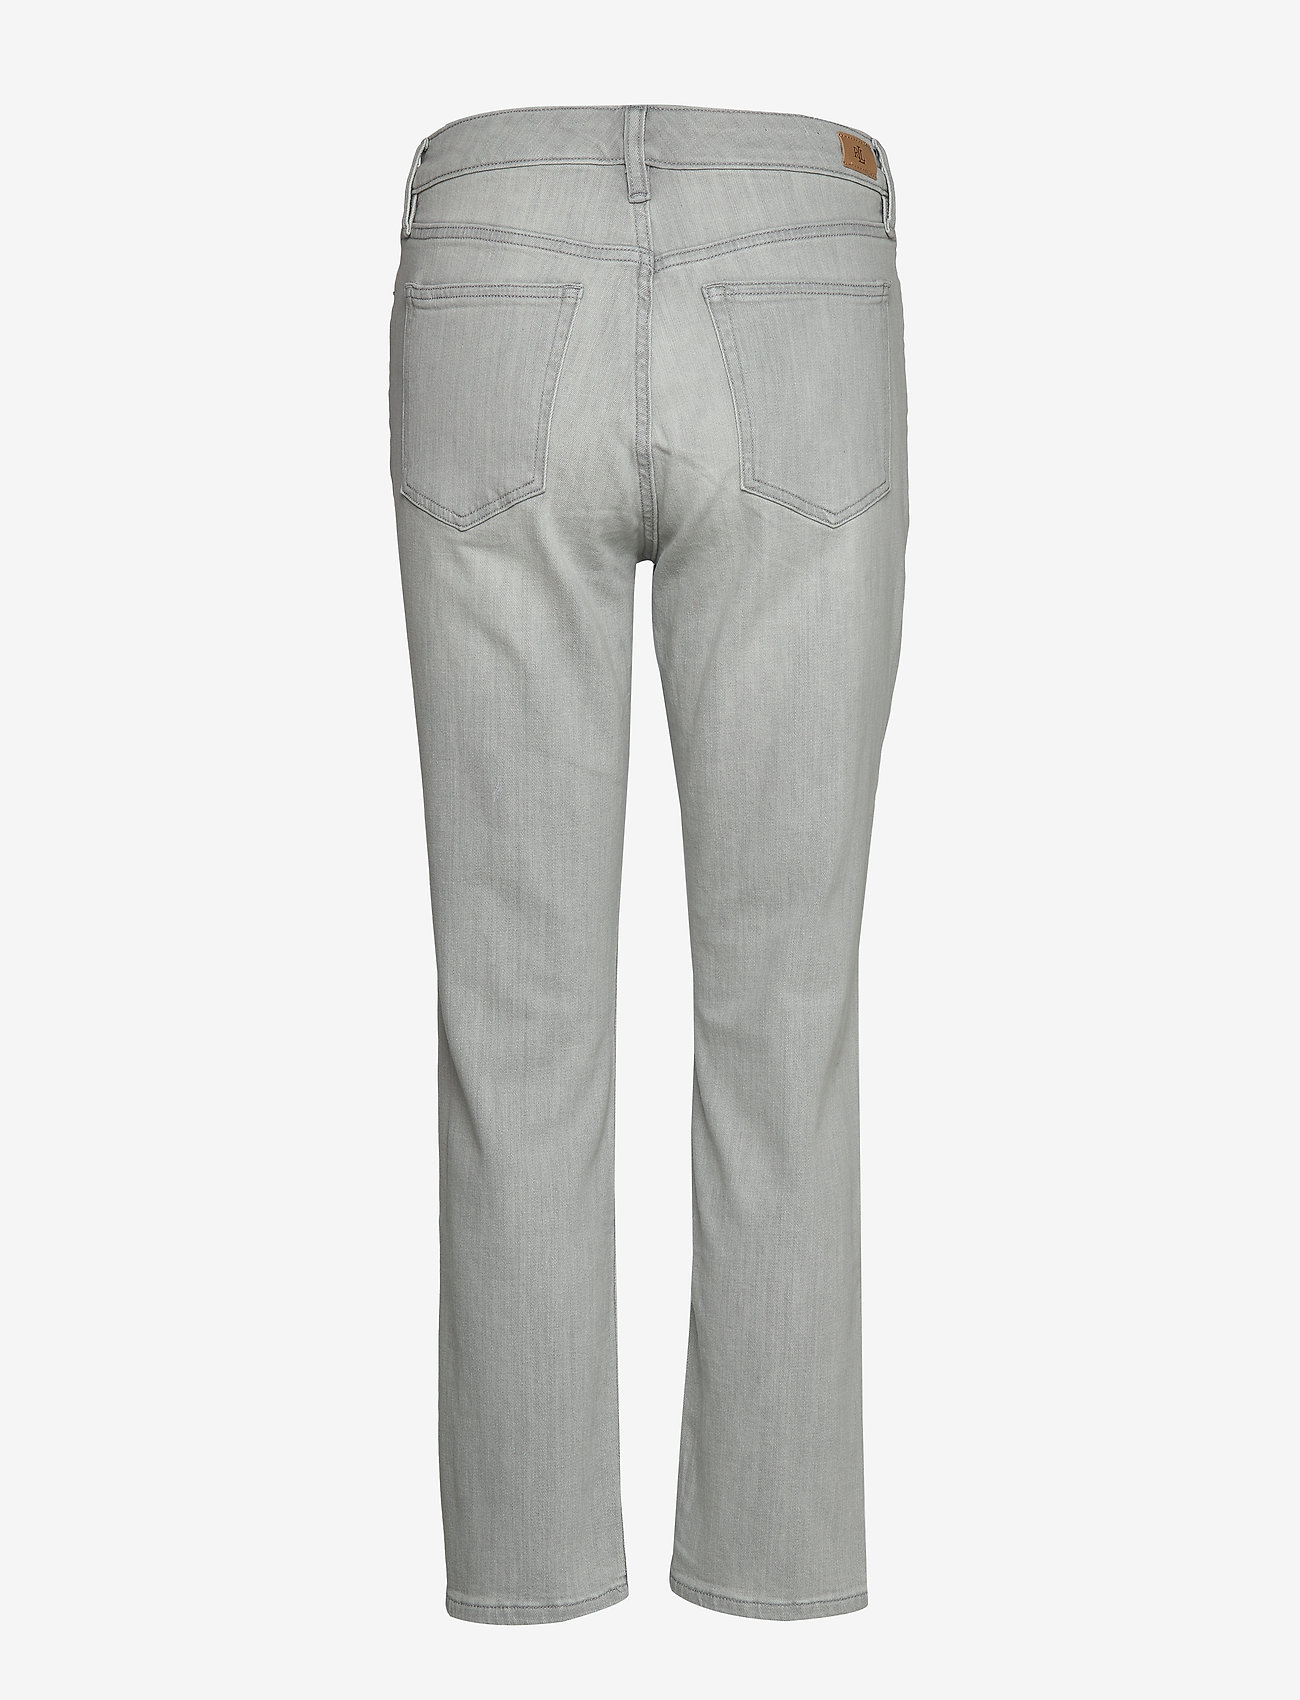 Lauren Ralph Lauren Premier Straight Ankle Jean - Jeans SOFT GREY WASH - Dameklær Spesialtilbud